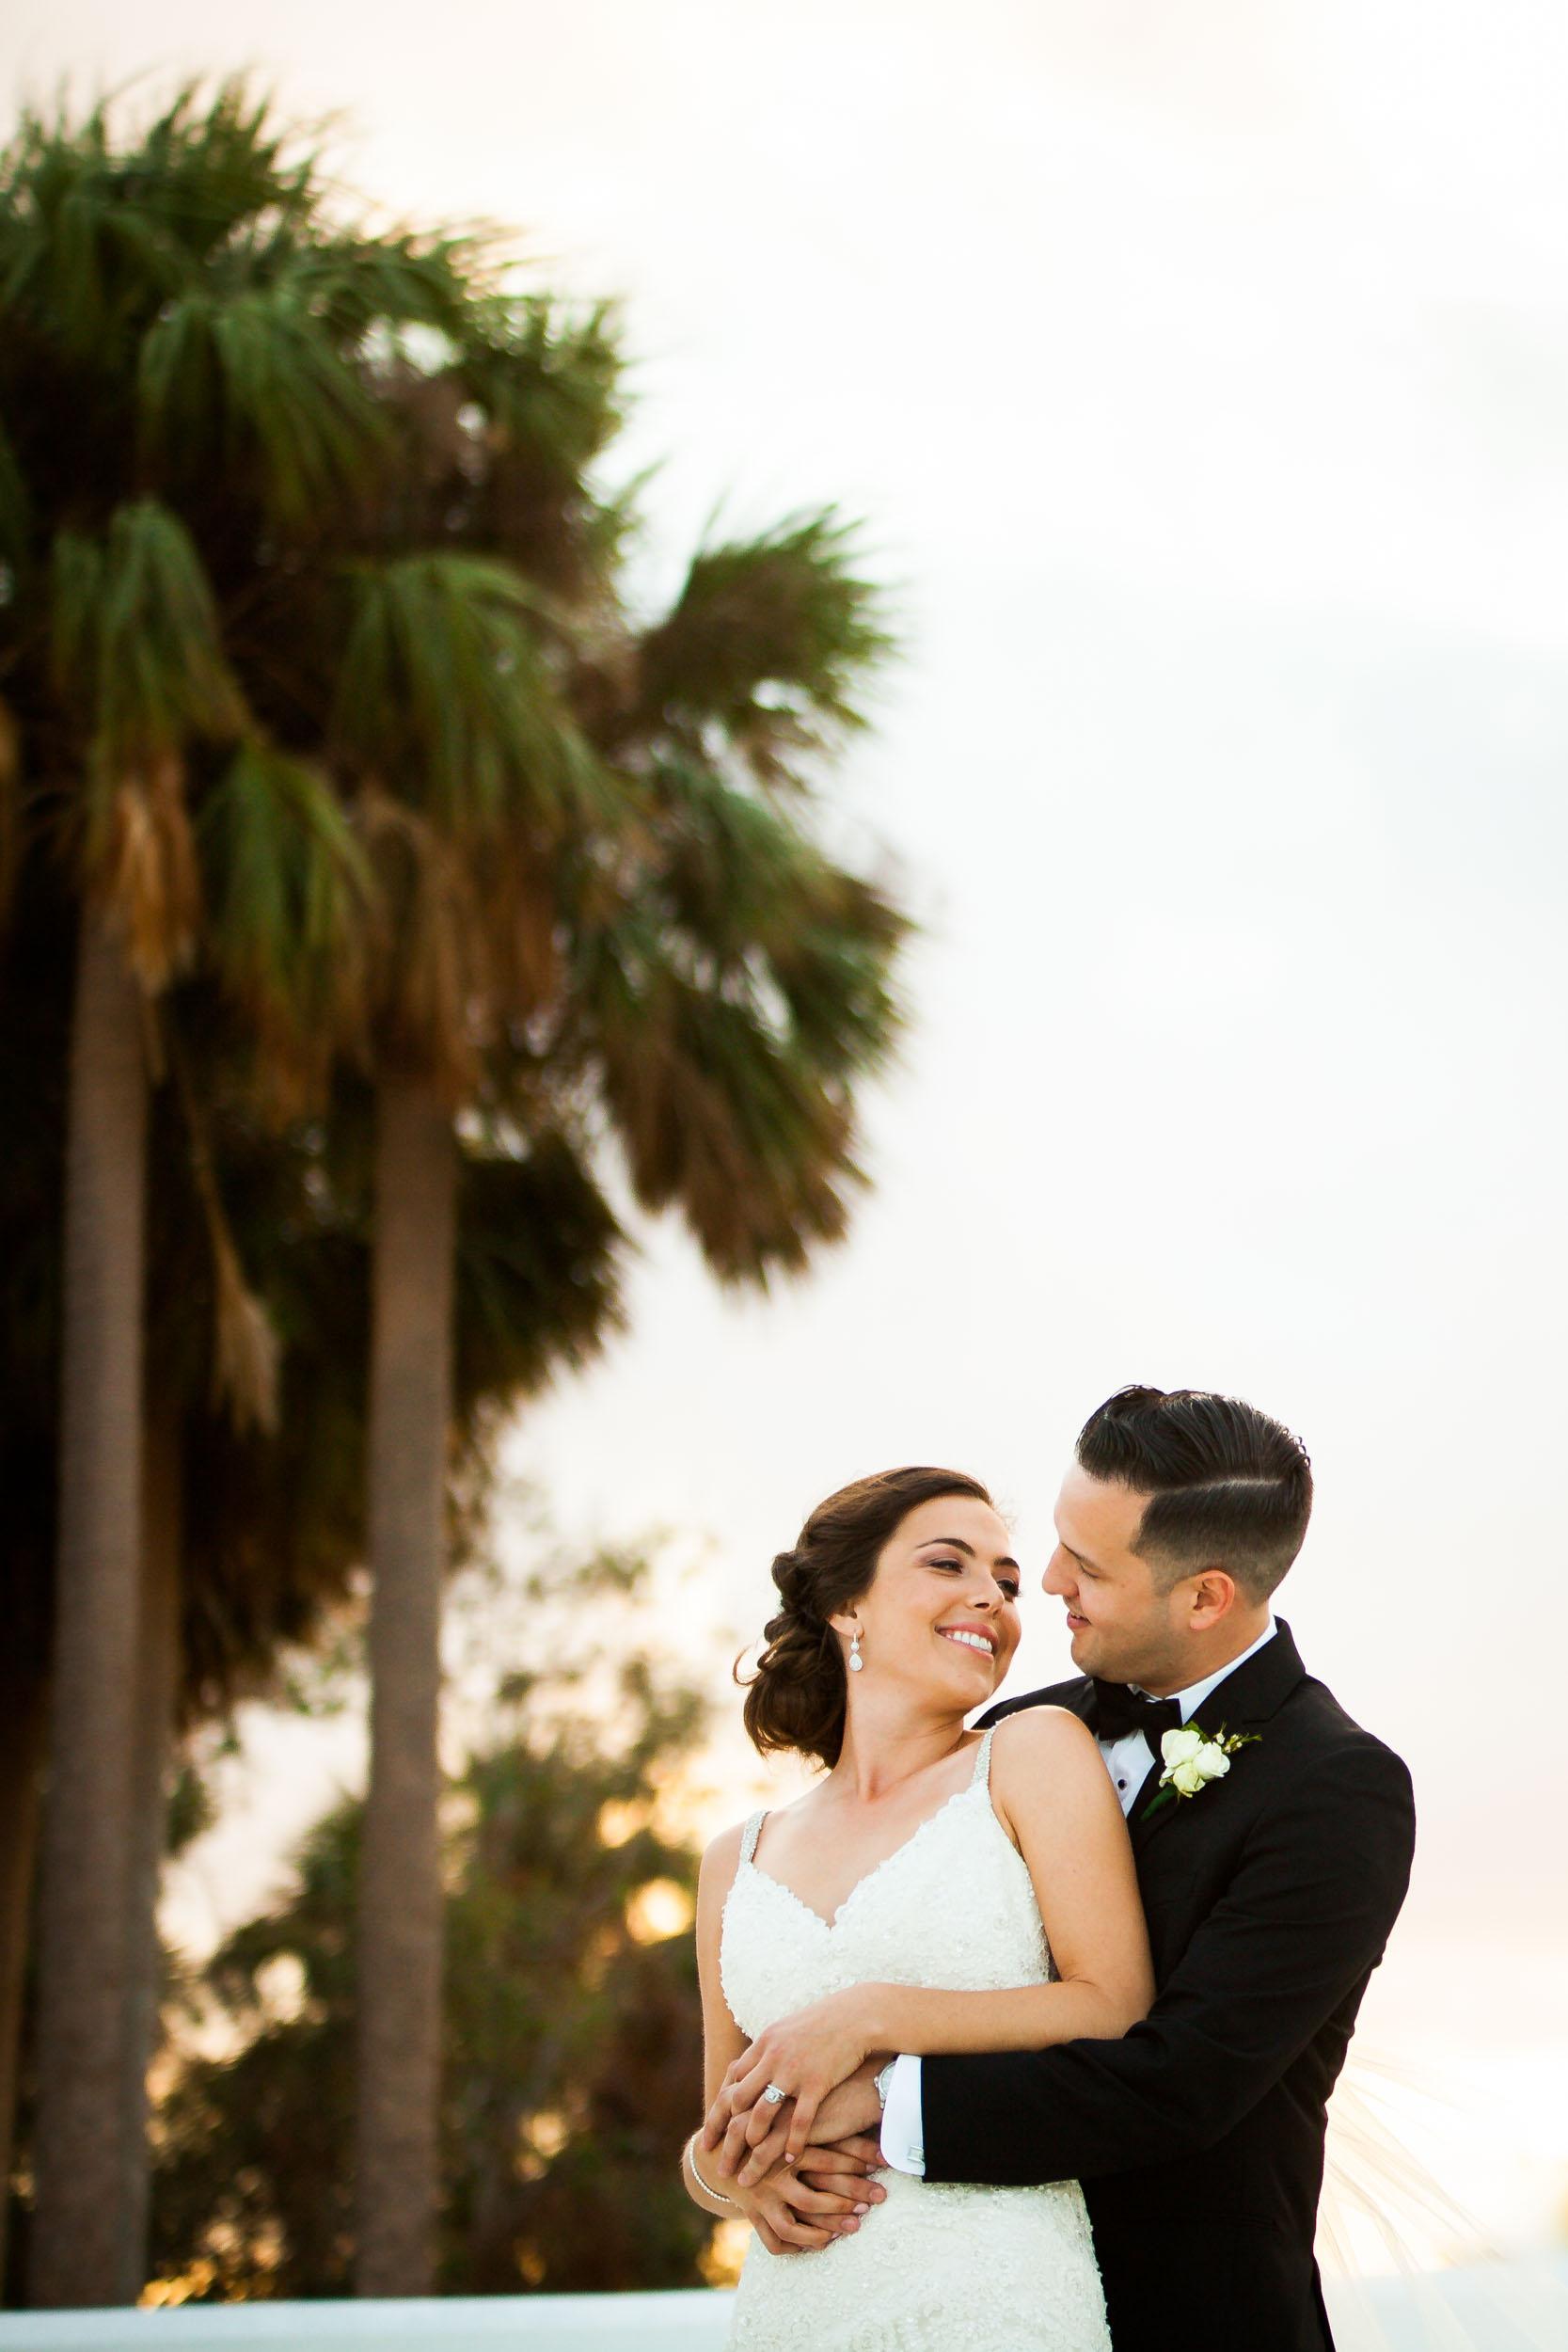 Flordia-Wedding-Photography-52.jpg